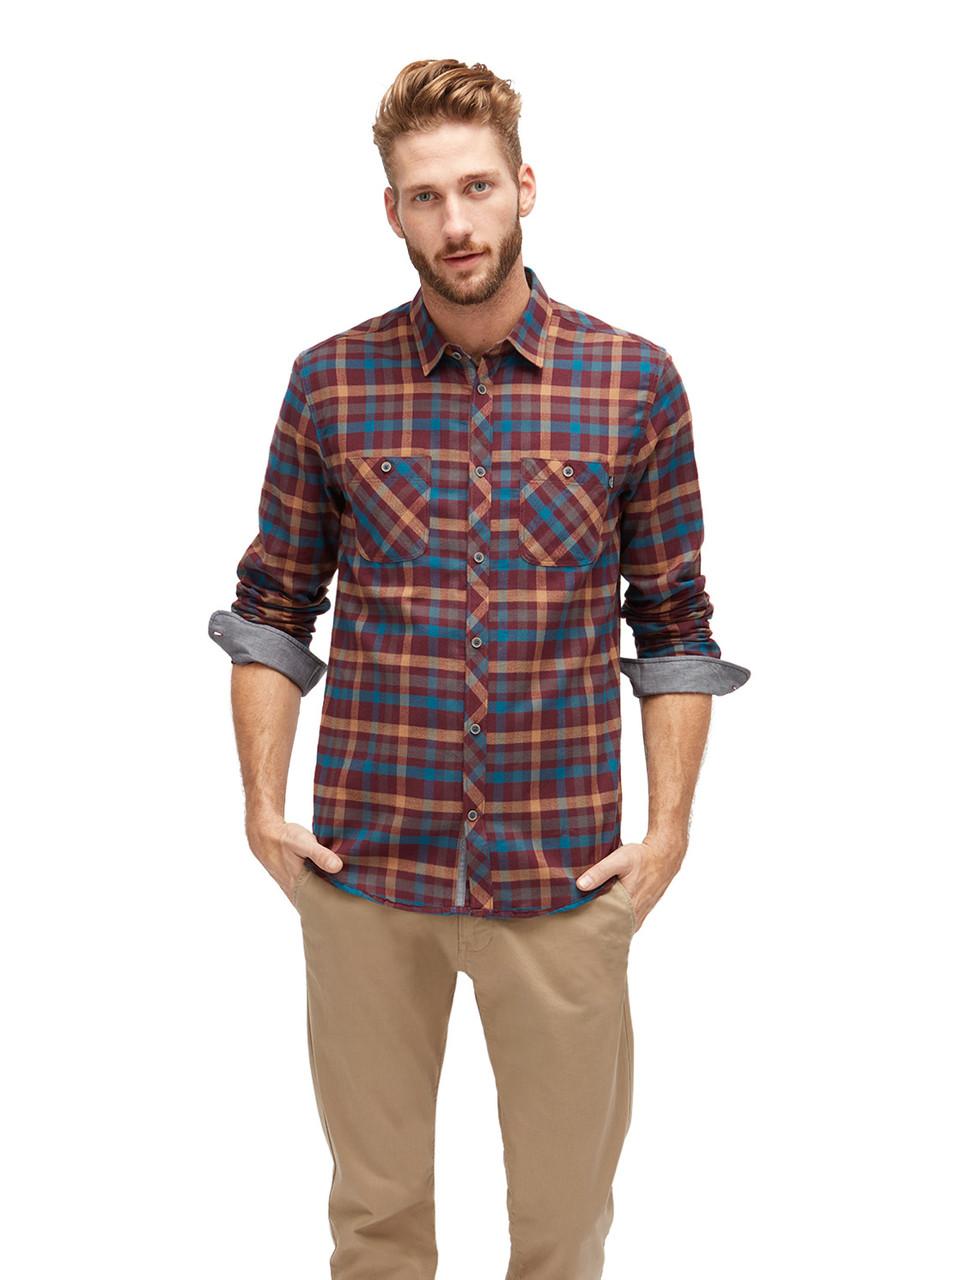 Рубашка Tom Tailor 203390300108 M Бордовый